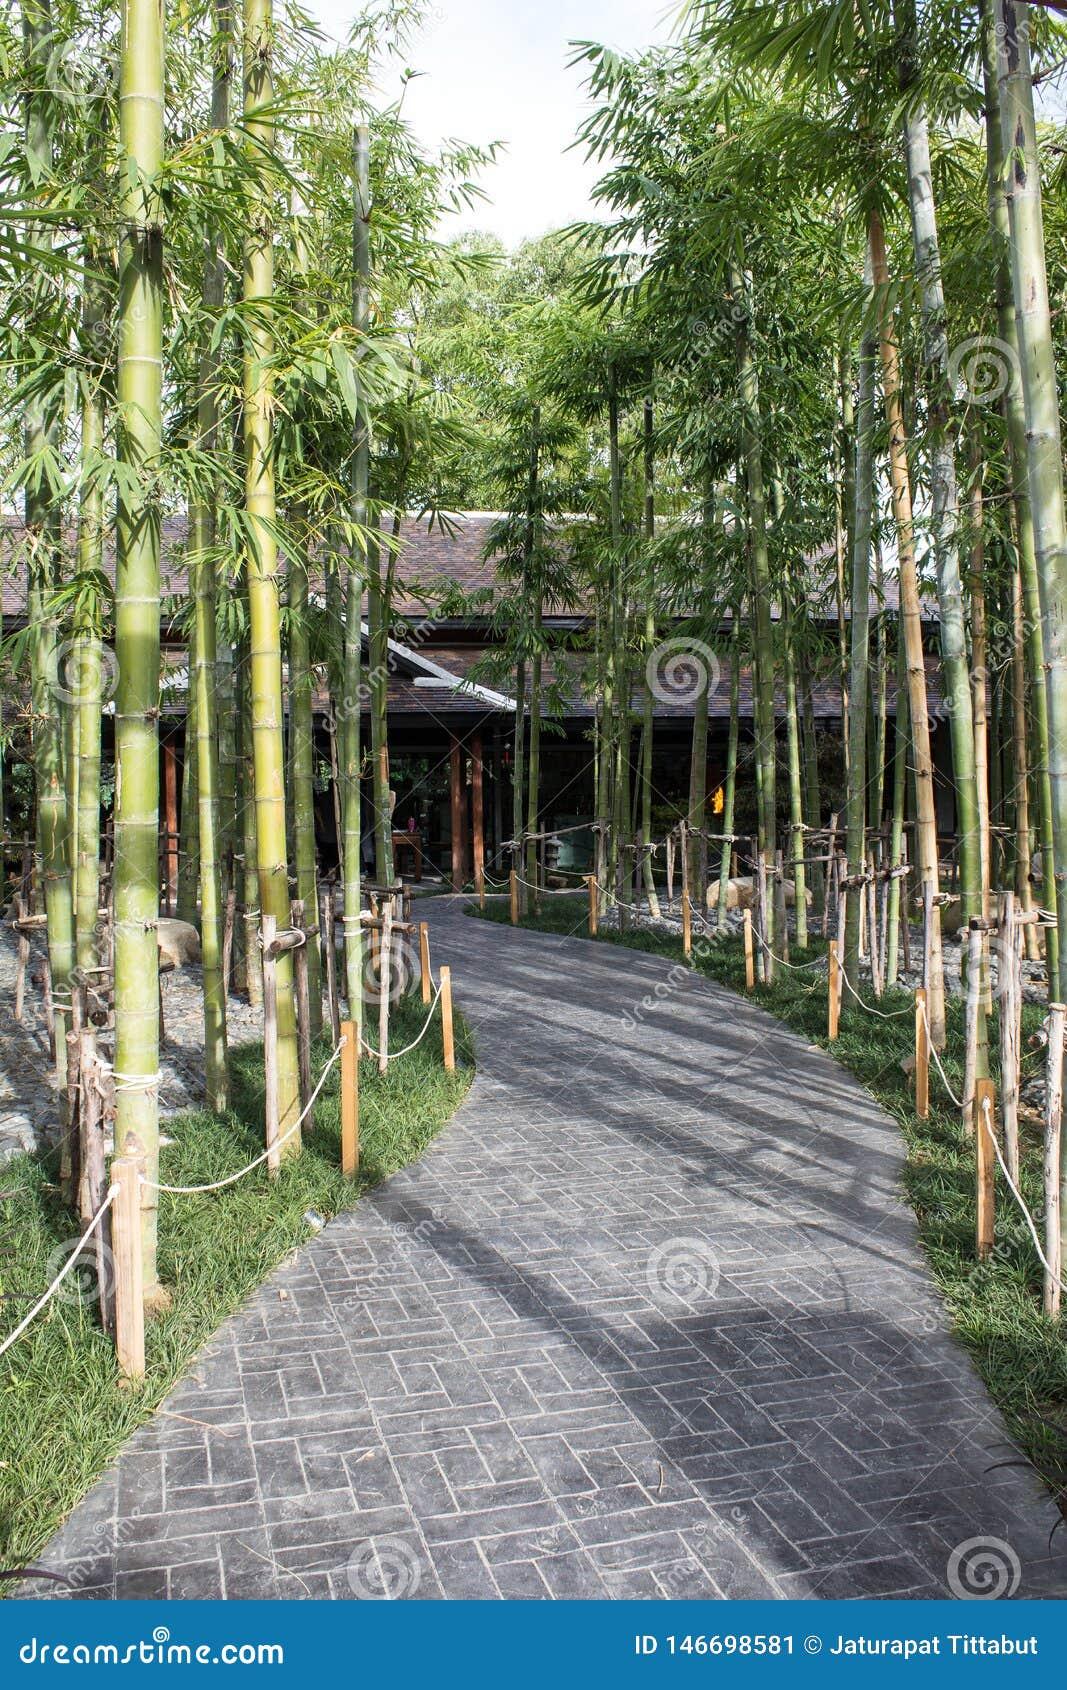 Japanese Bamboo Garden in Nekoemon cafe chiang mai thailand